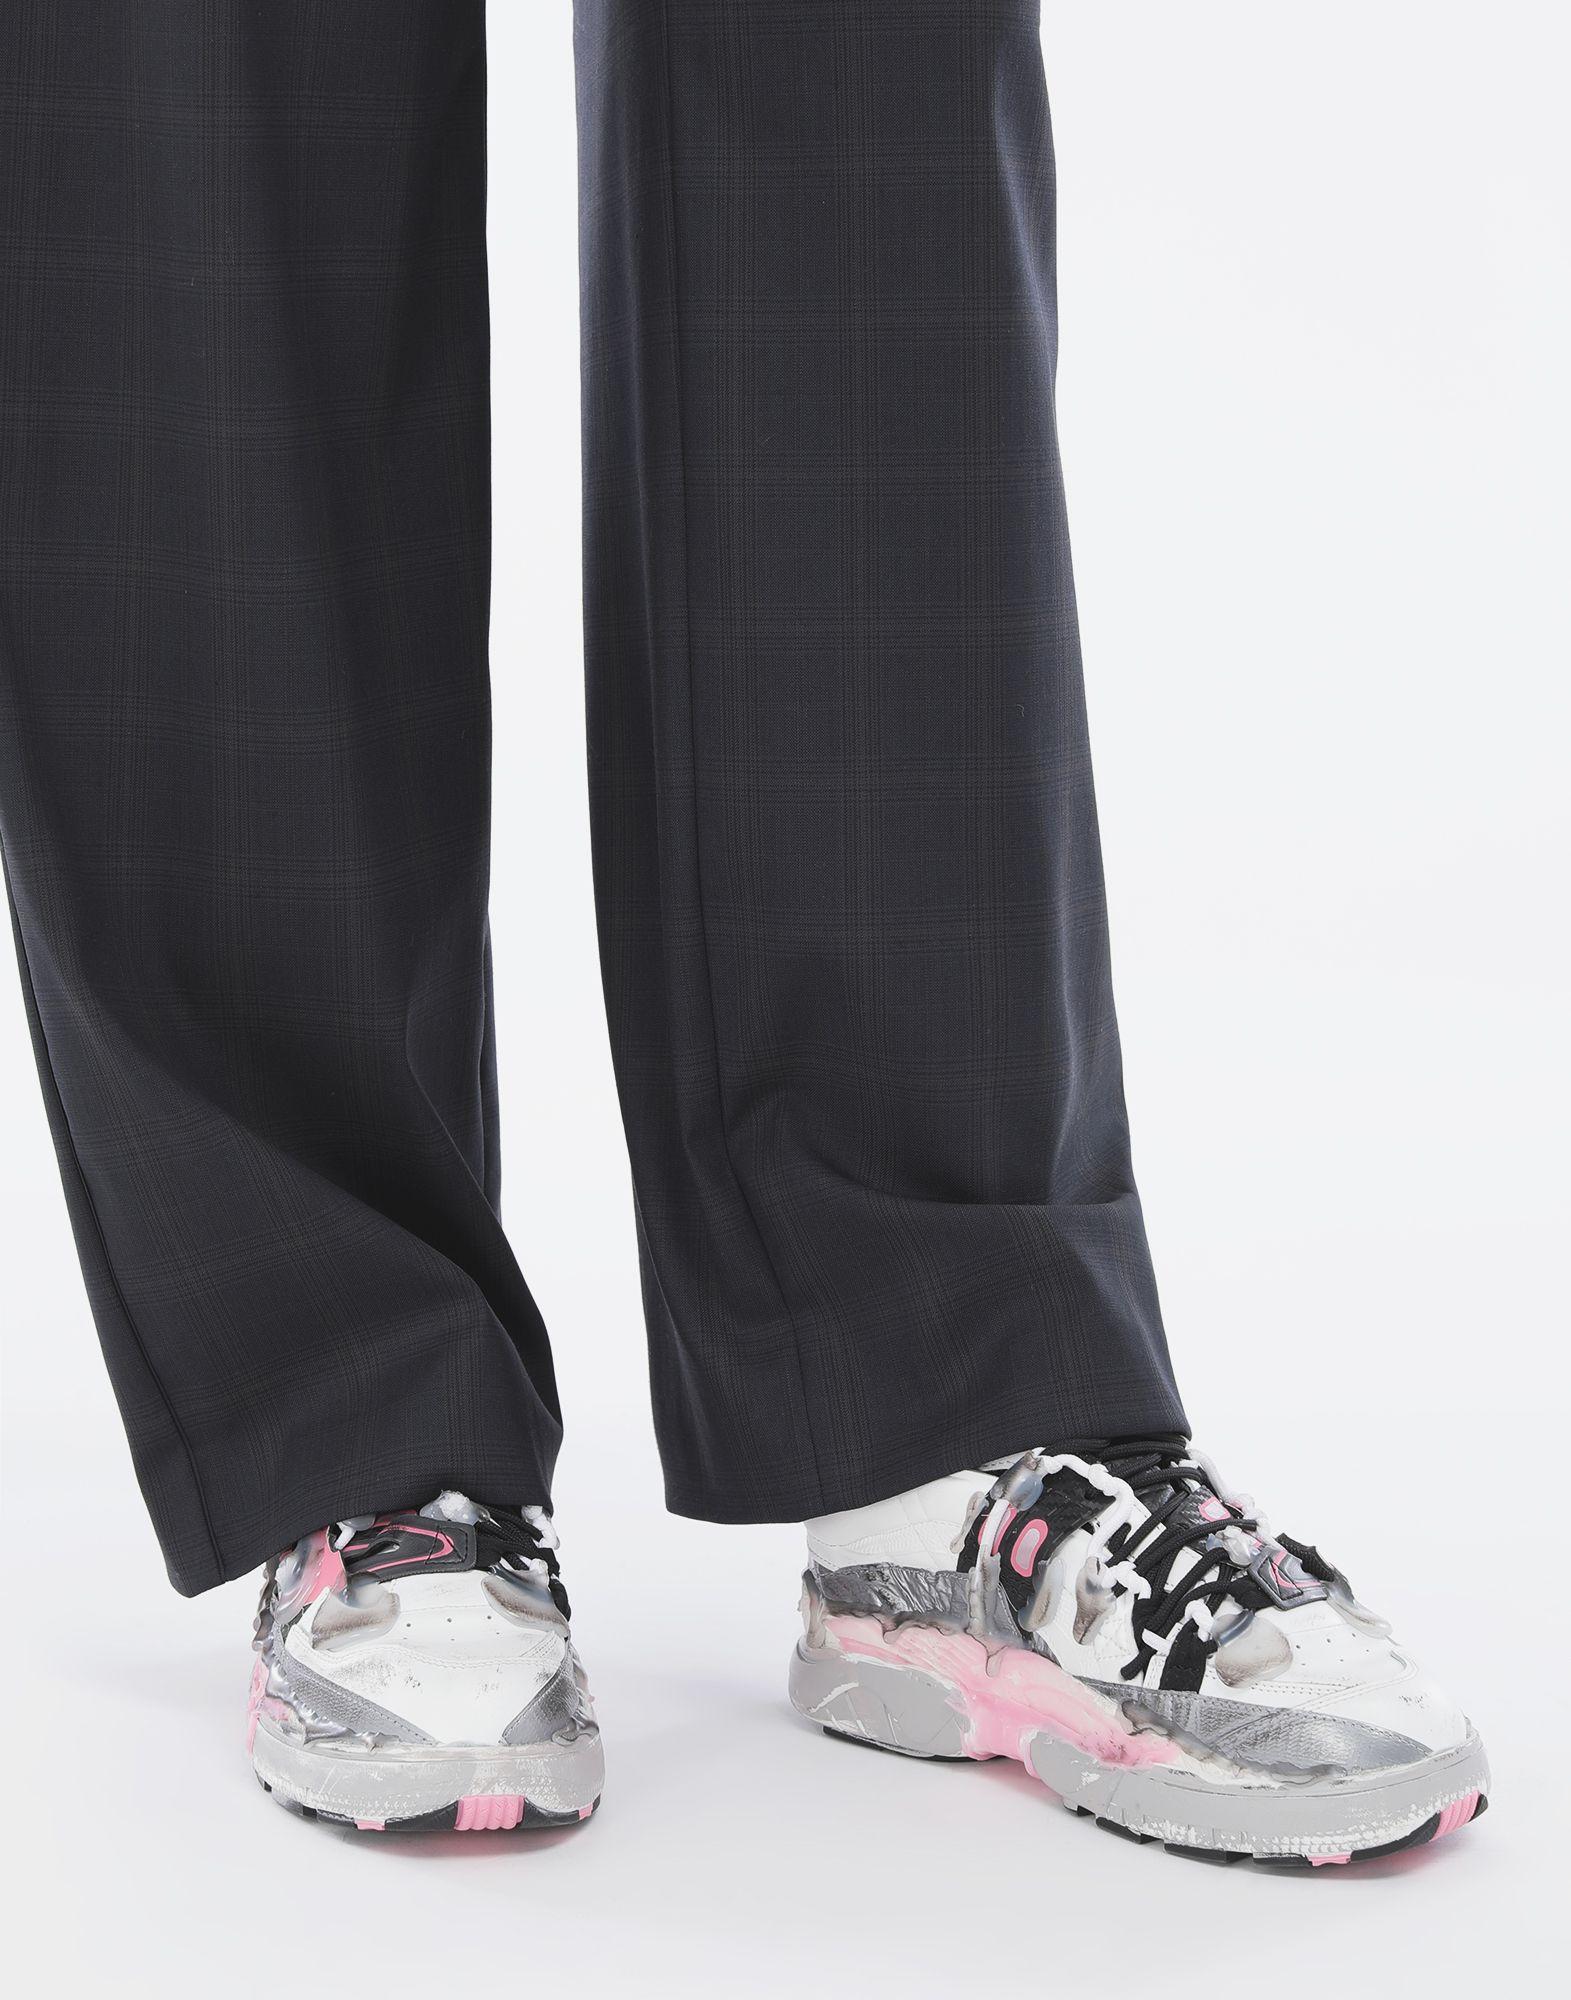 MAISON MARGIELA Sneakers Fusion Sneakers Damen r